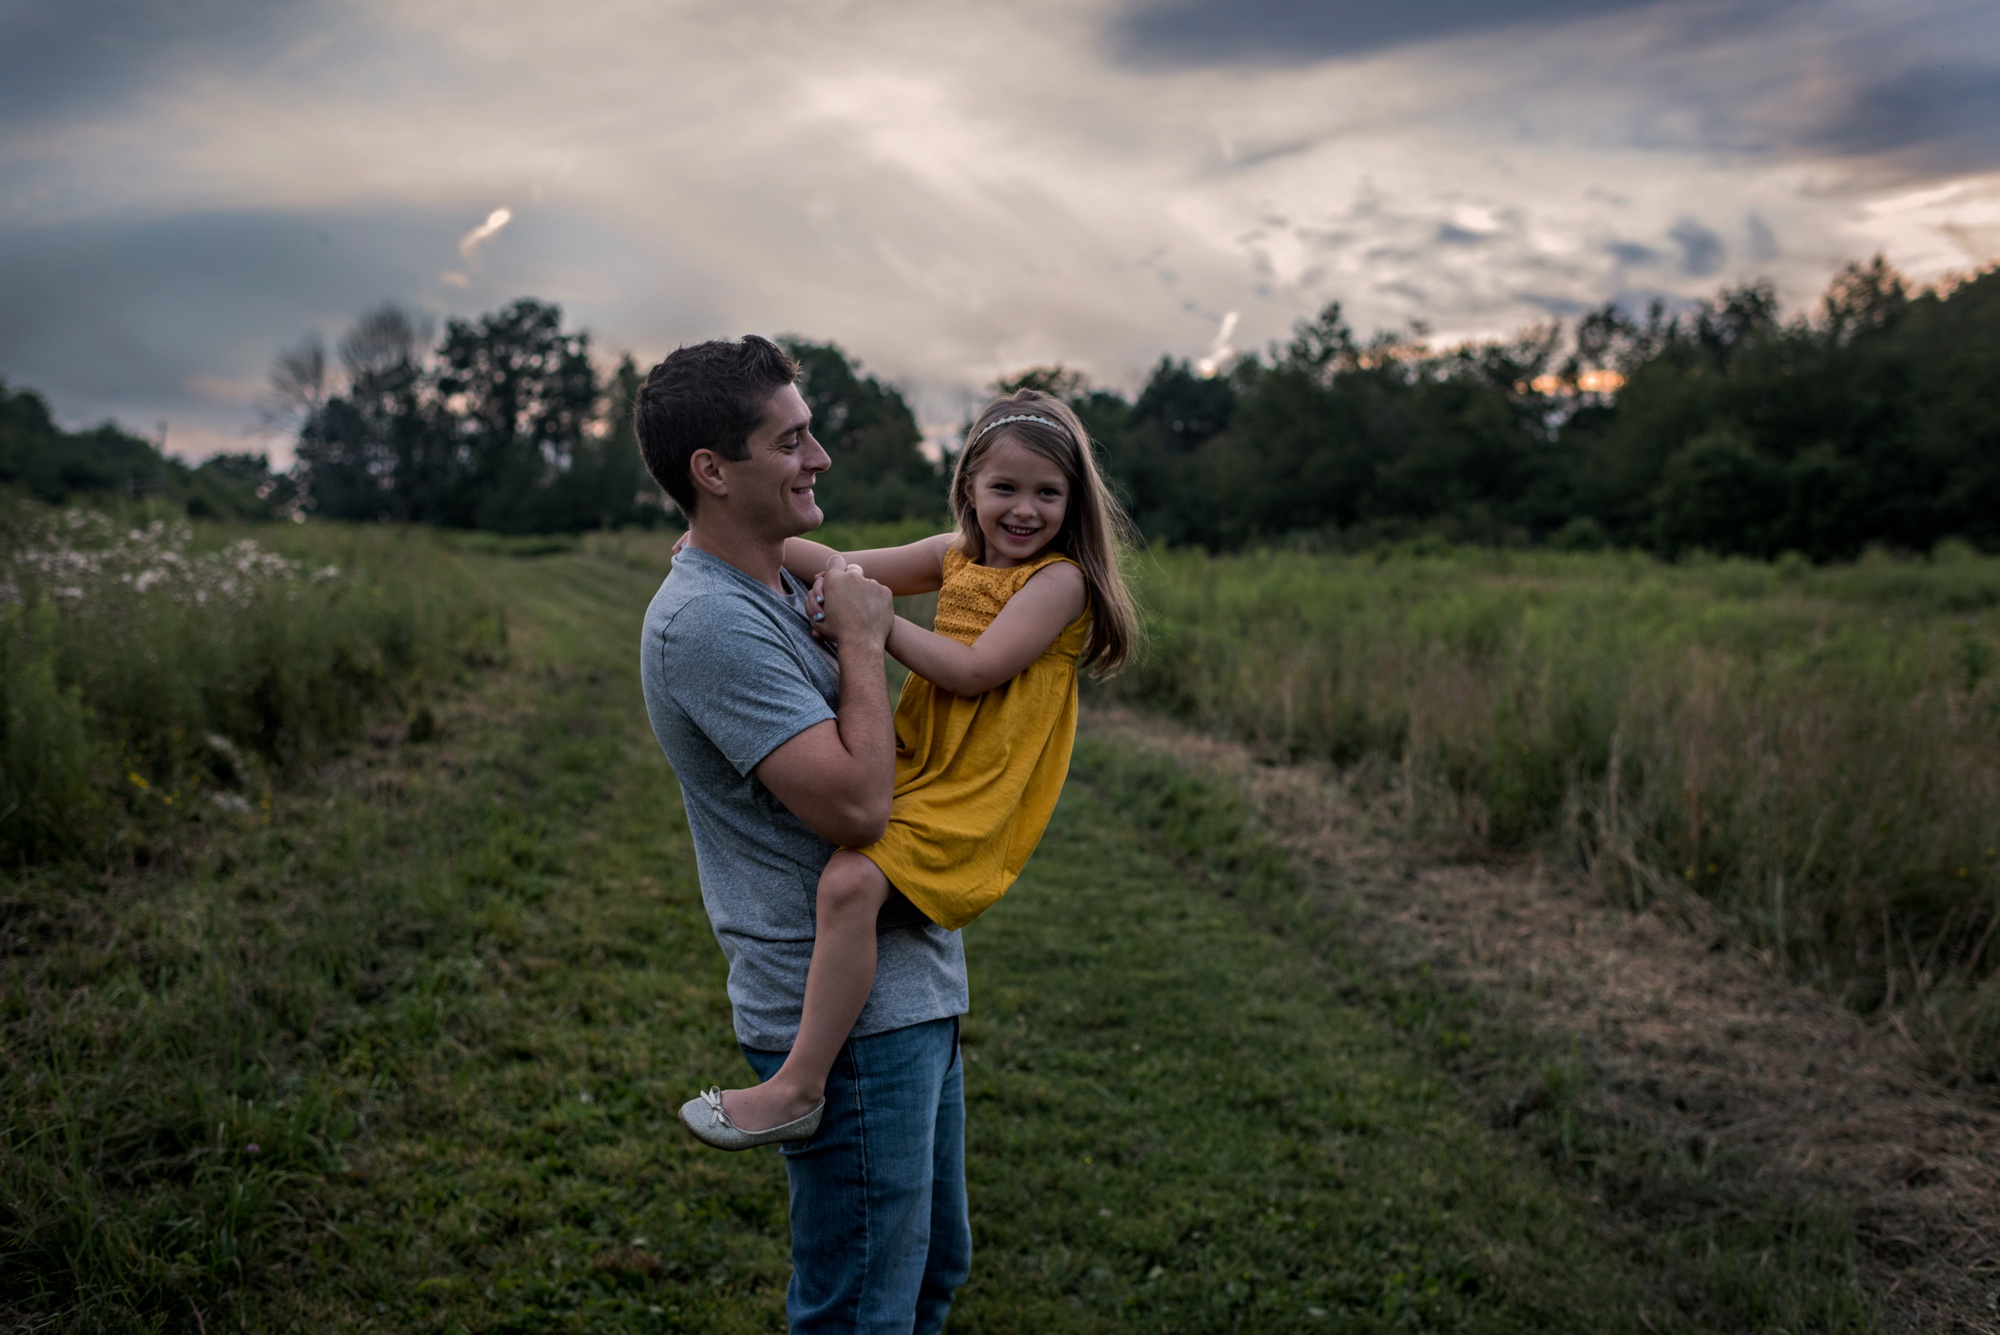 family-maternity-misanko-lauren-grayson-akron-ohio-photographer_0103.jpg